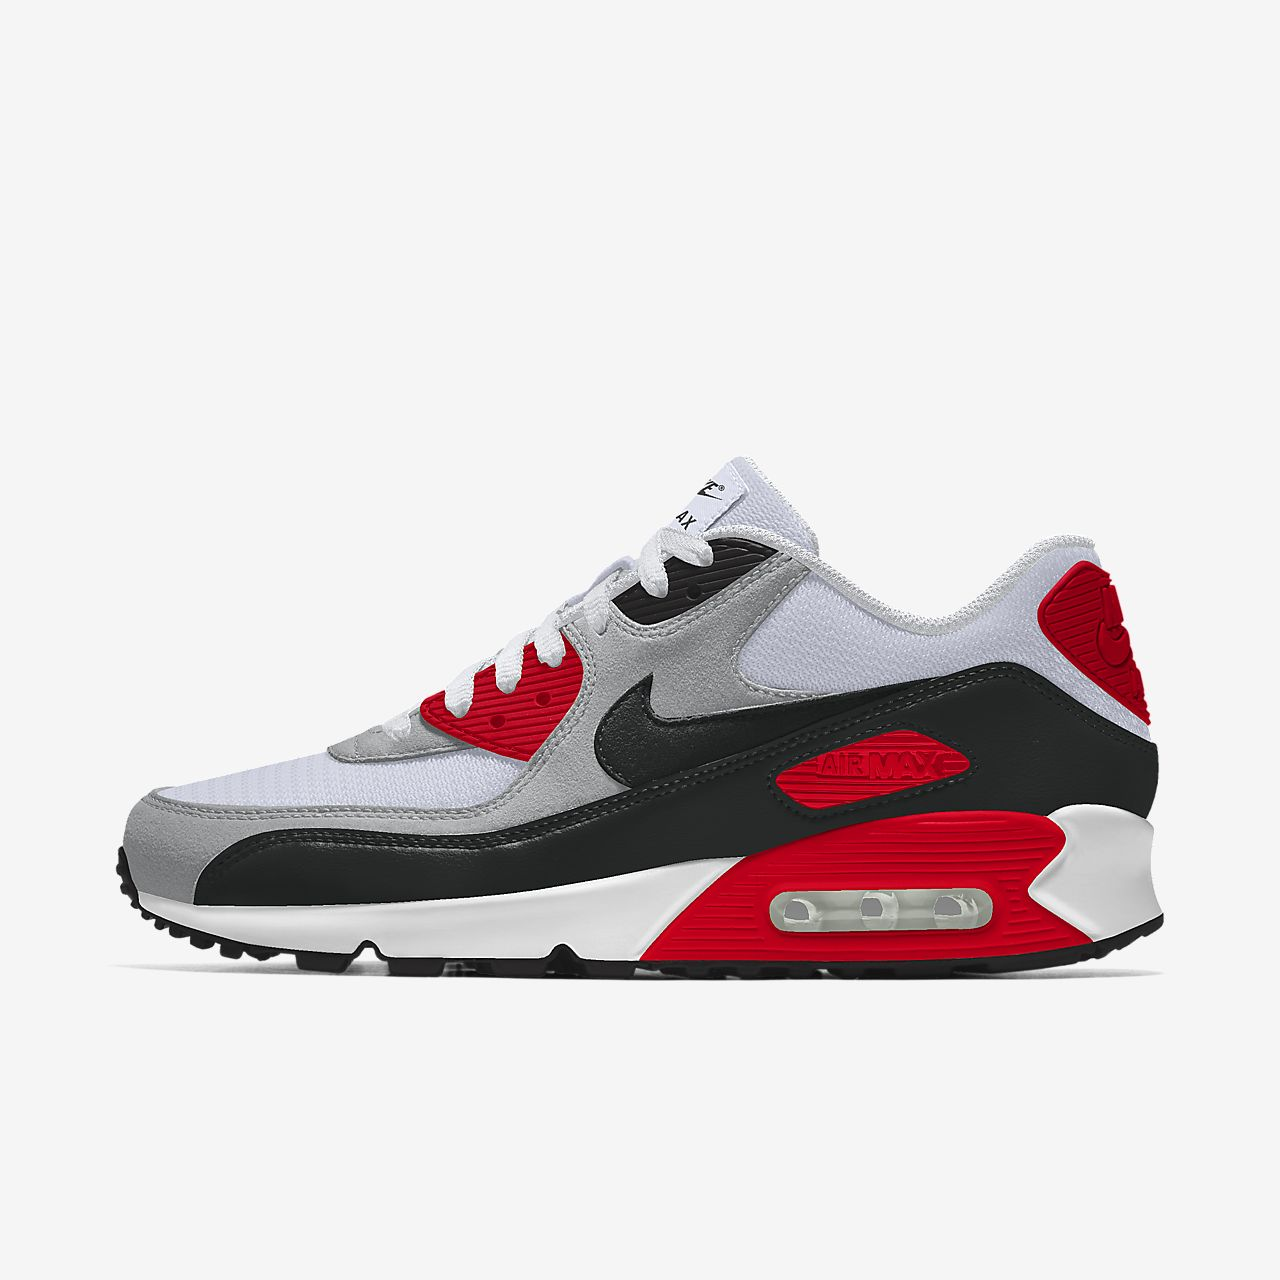 Nike Air Max 90 By You Custom herenschoen